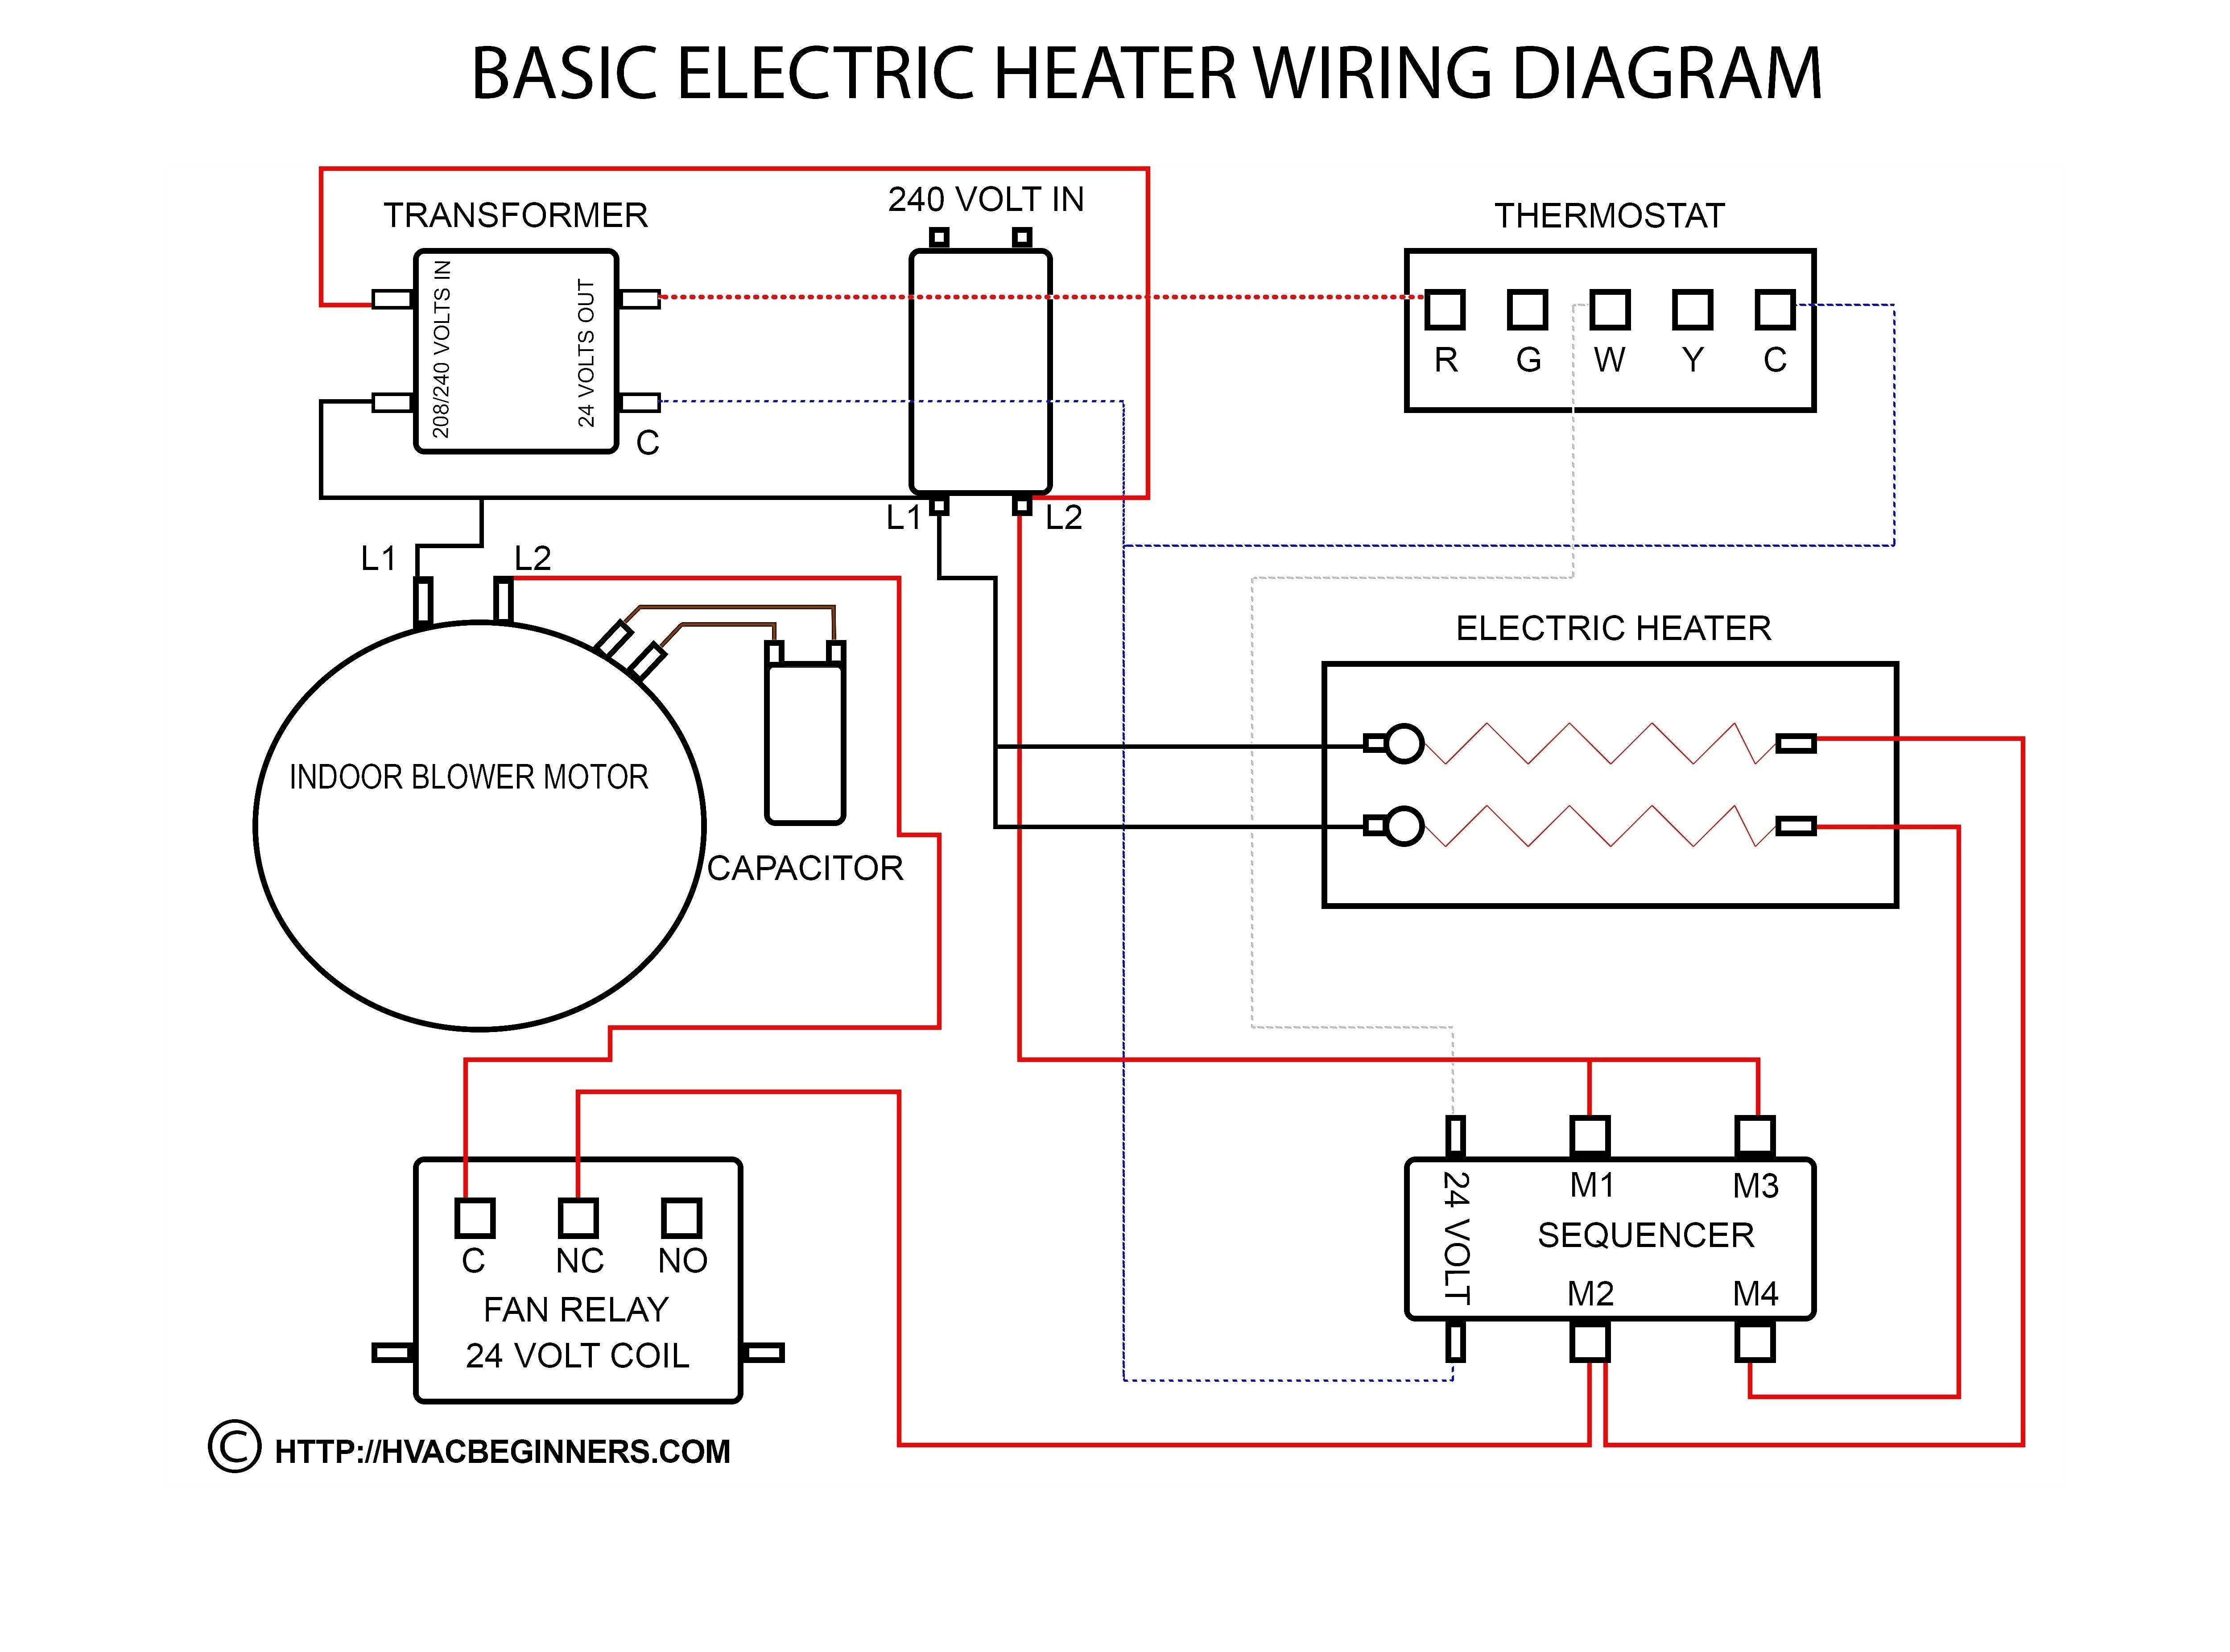 [SCHEMATICS_4CA]  Auto Transformer Air Conditioner Wiring Diagram | Wiring Diagram | Furnace Transformer Wiring For Home |  | Wiring Diagram - Autoscout24